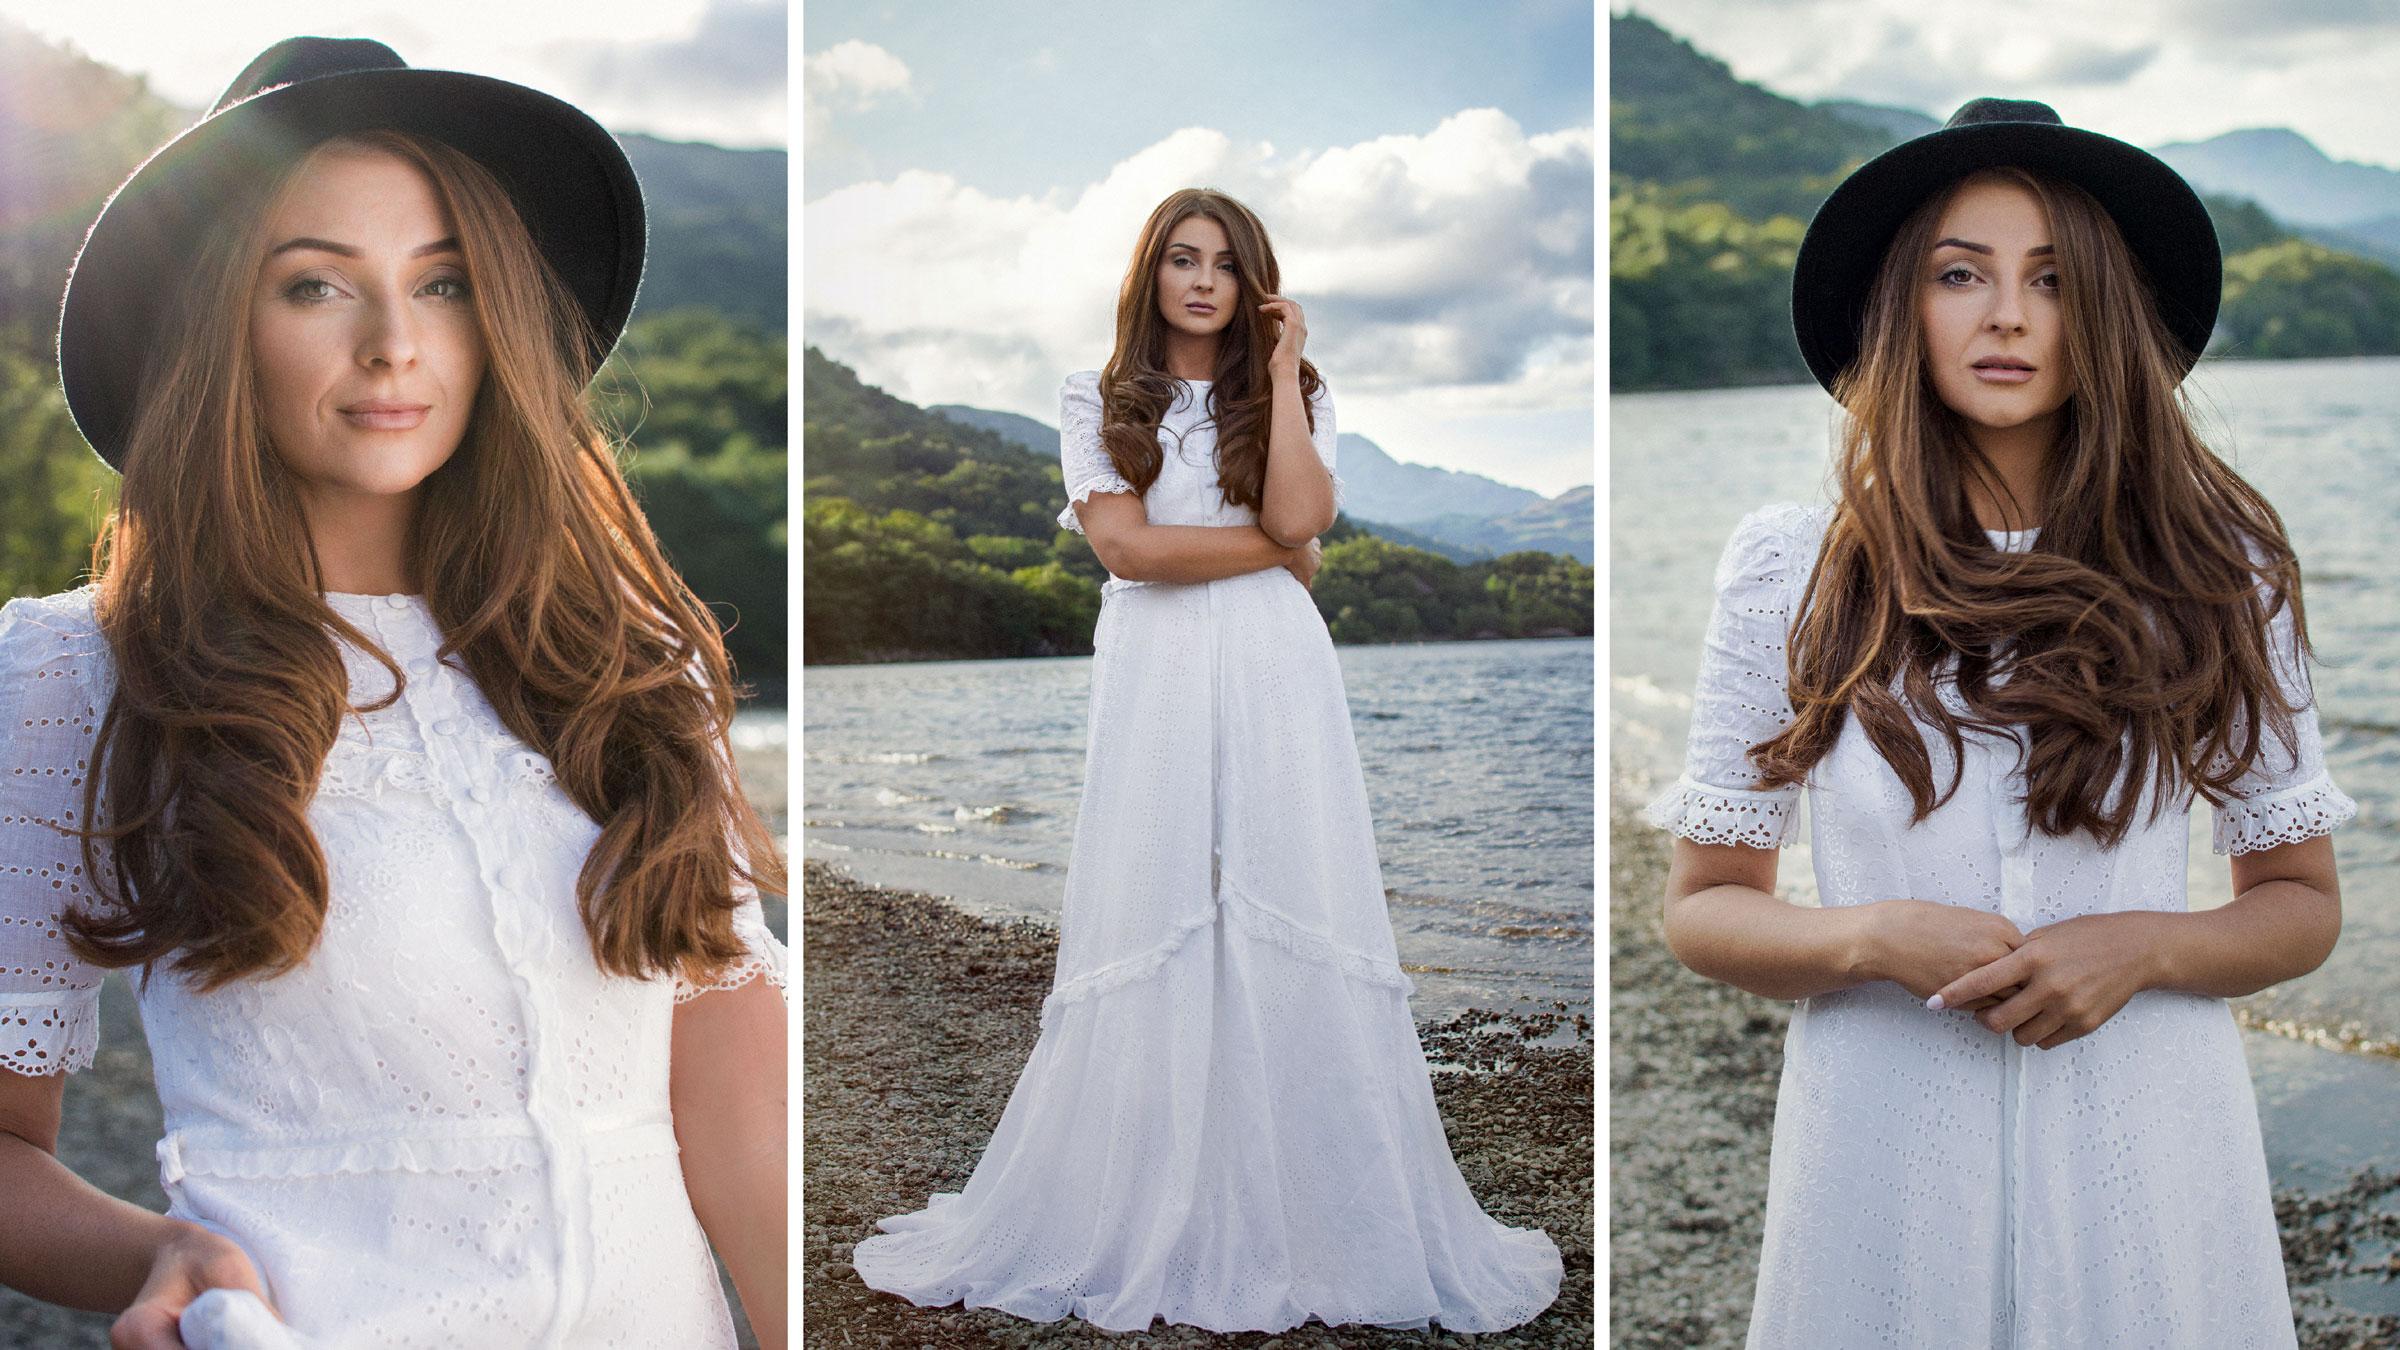 charlotte-kensington-portraits-ultimate-makeover-9.jpg